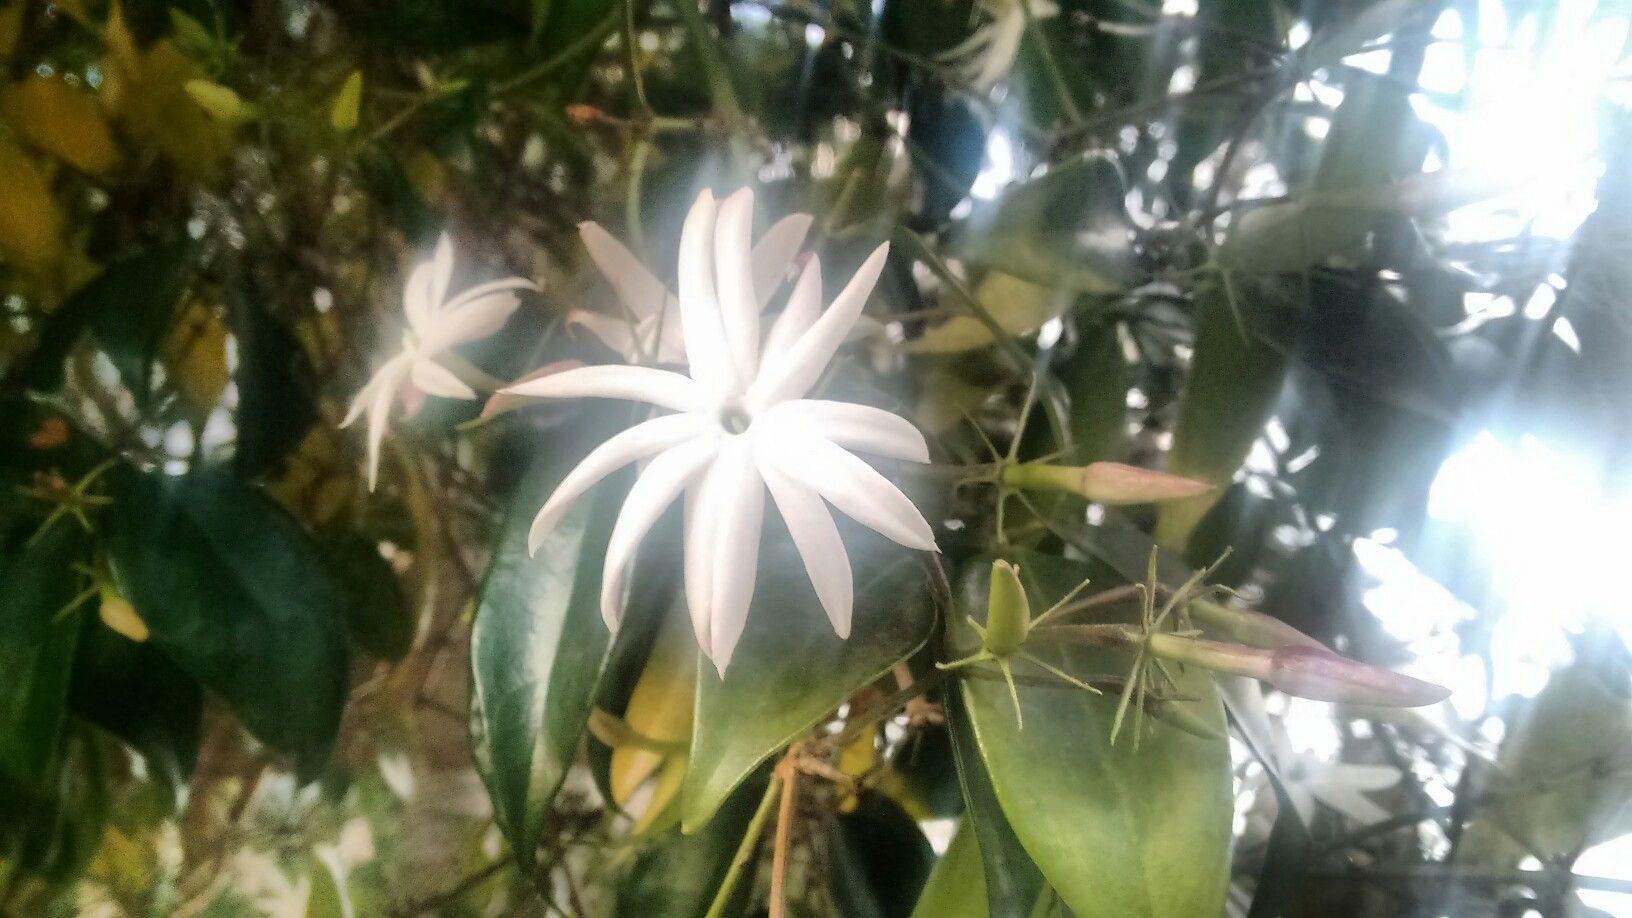 Flor de Guaco. A erva que afundeia sentimentos